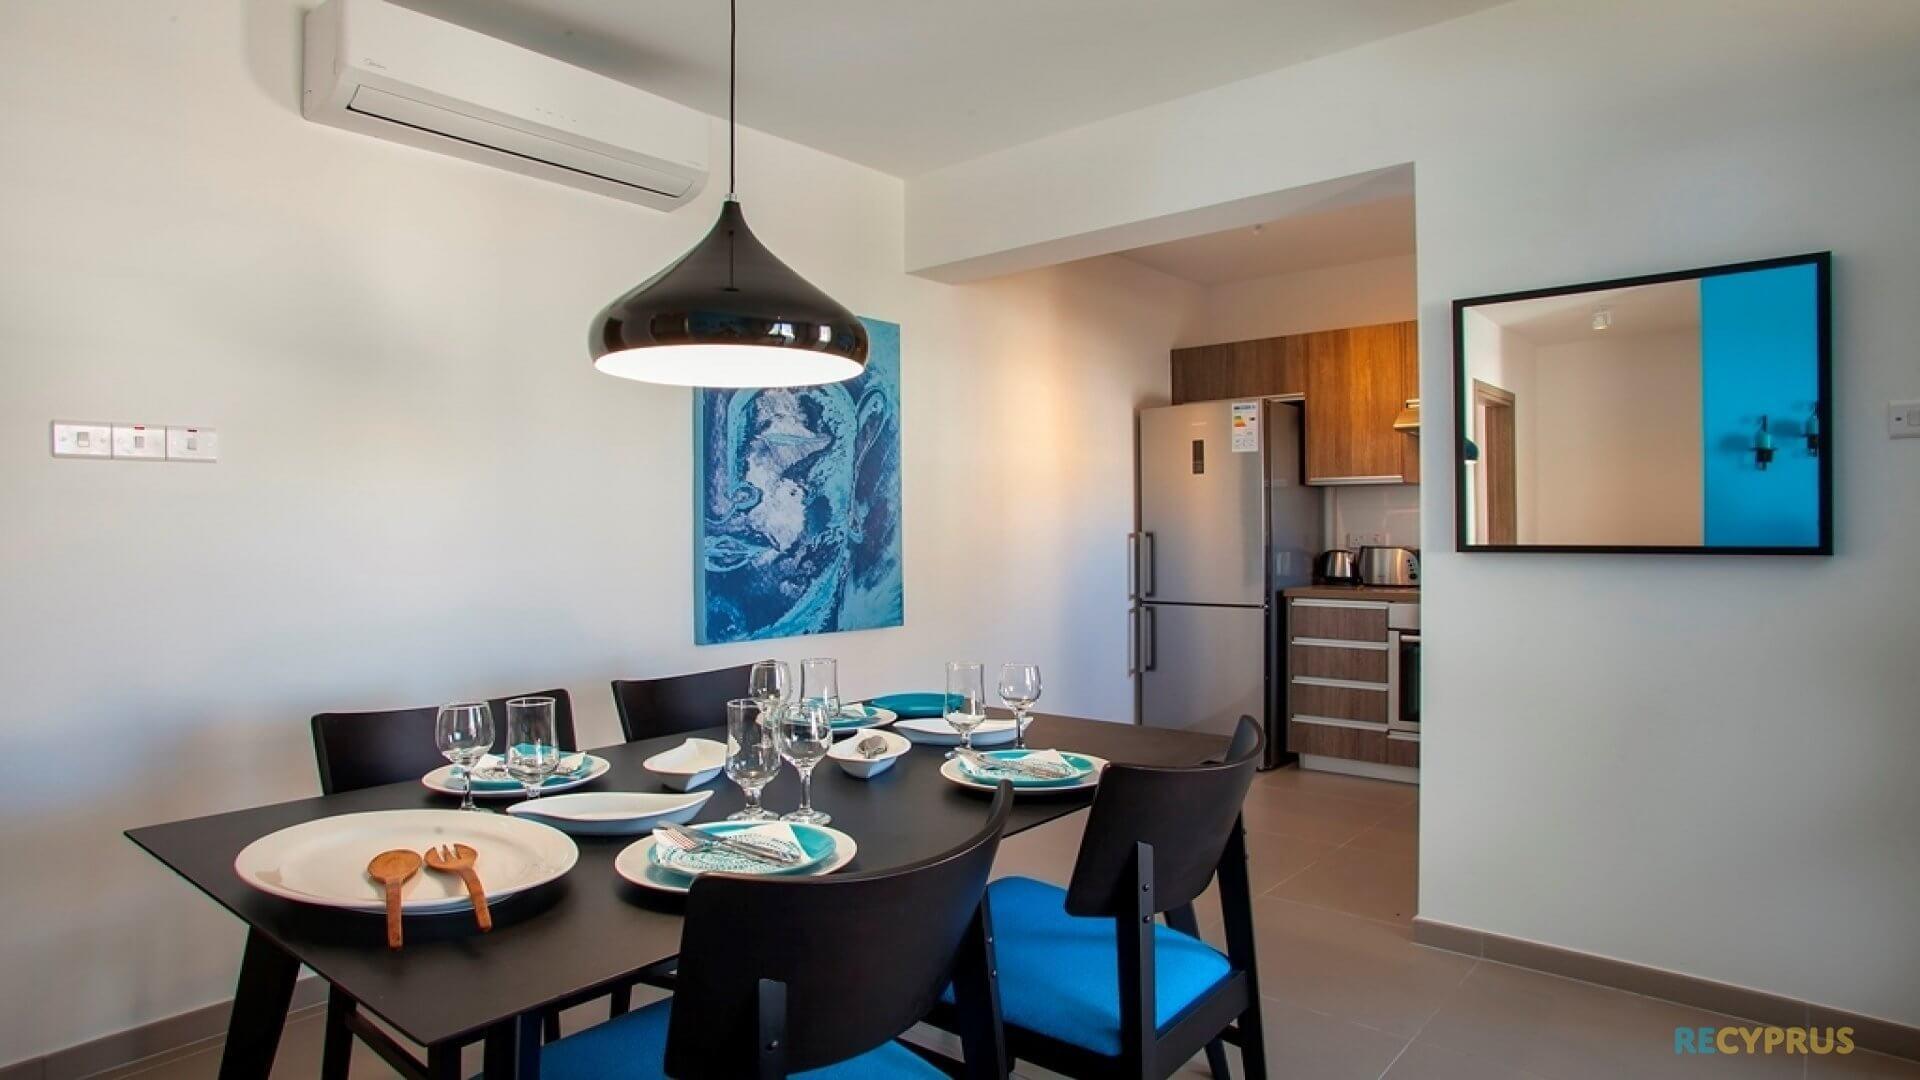 Apartment for sale Kapparis Famagusta Cyprus 4 3443